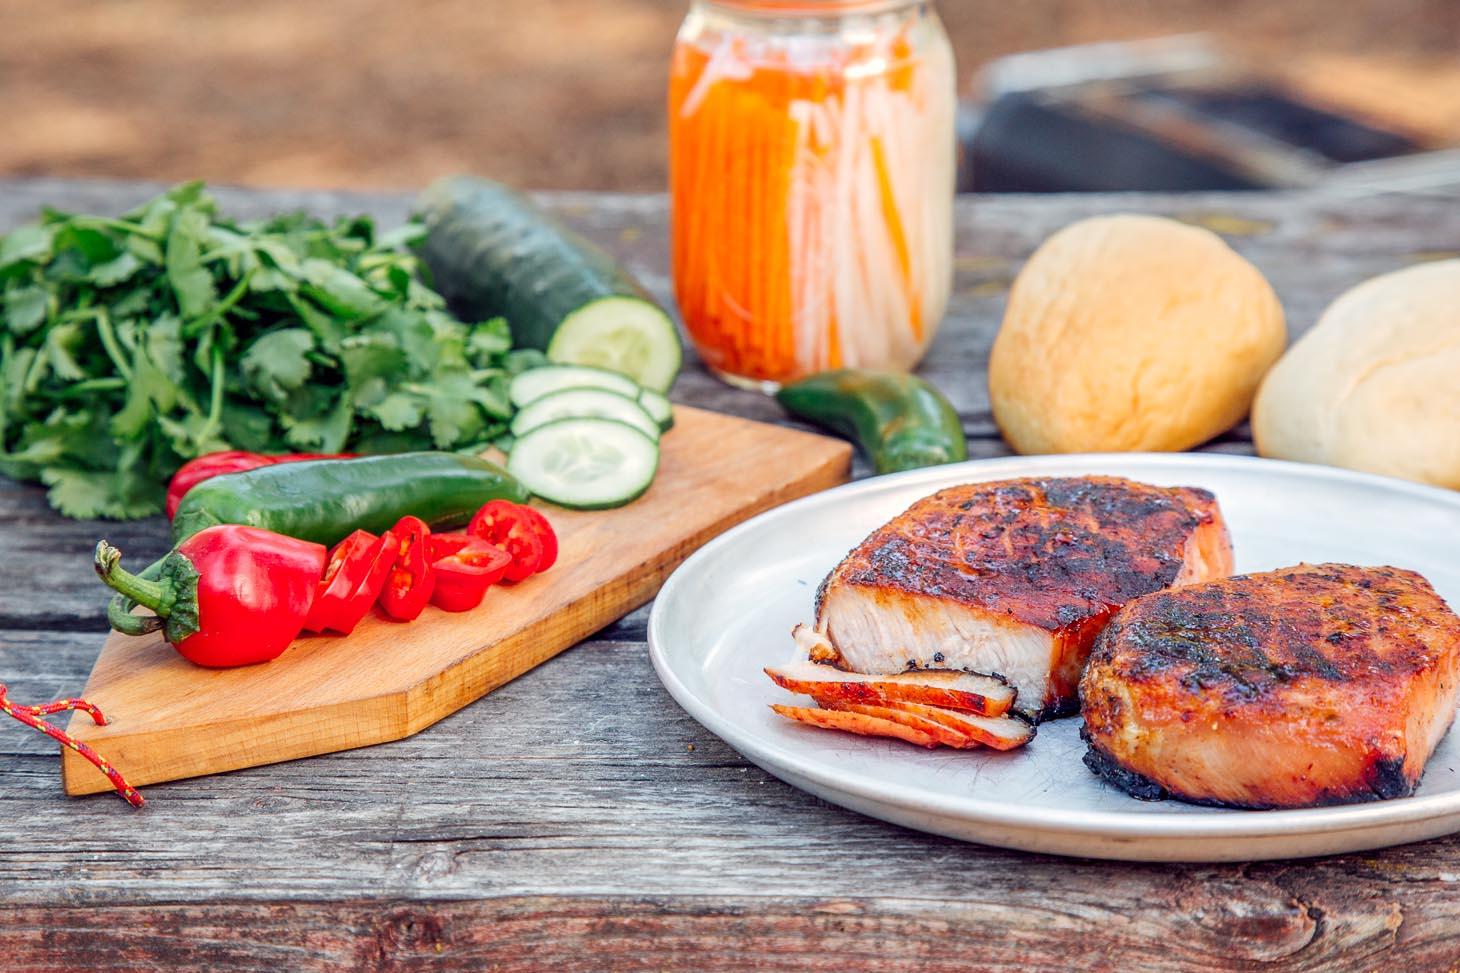 Sliced grilled pork loin on a plate